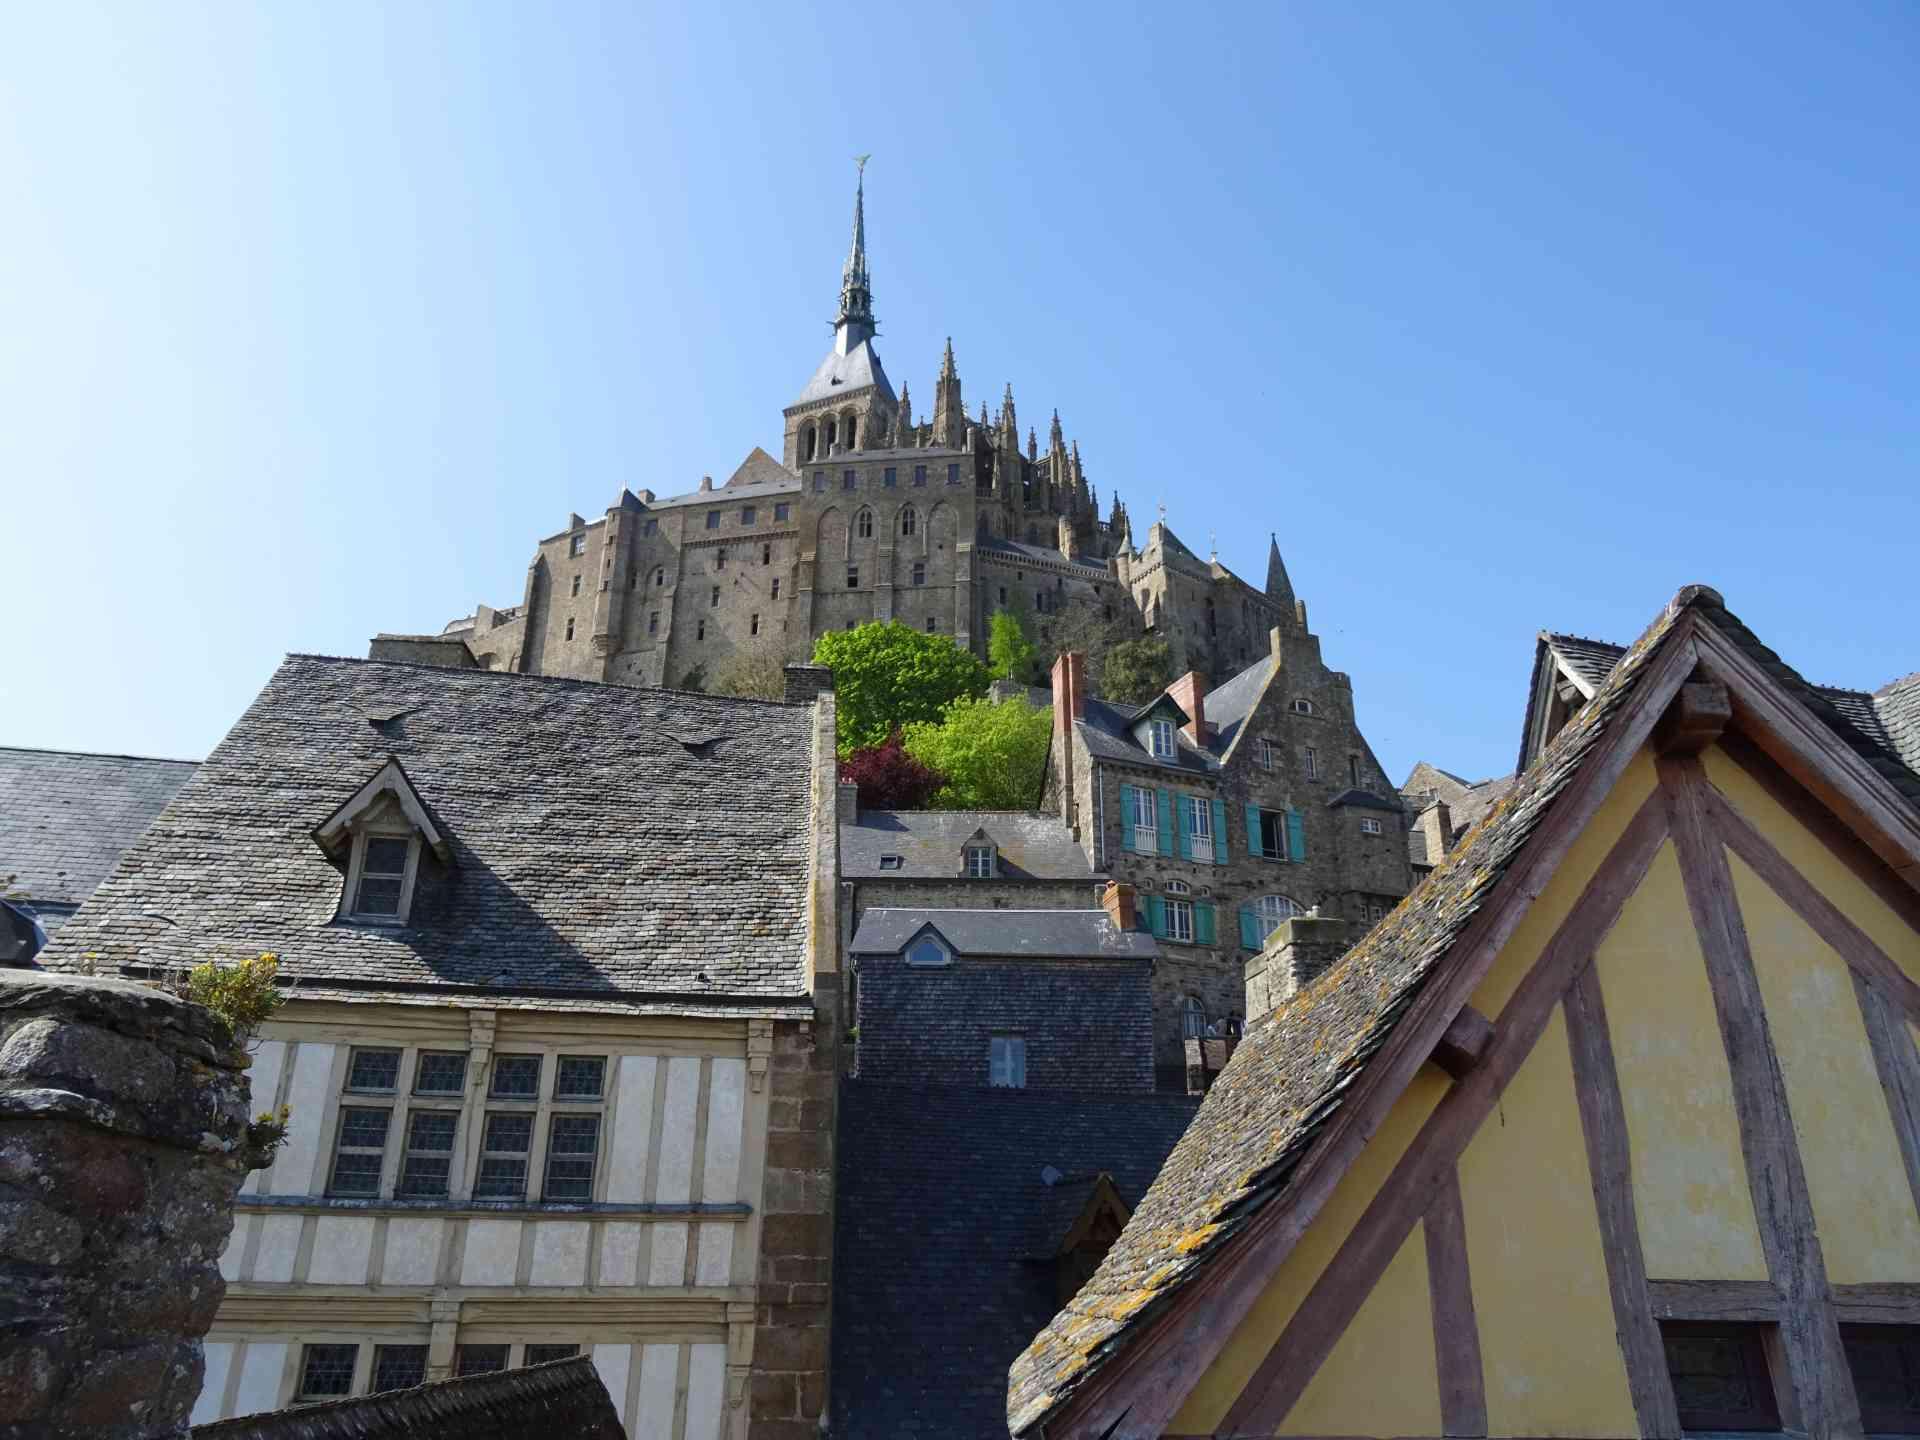 Mont St Michel, France by Dennis Bunnik